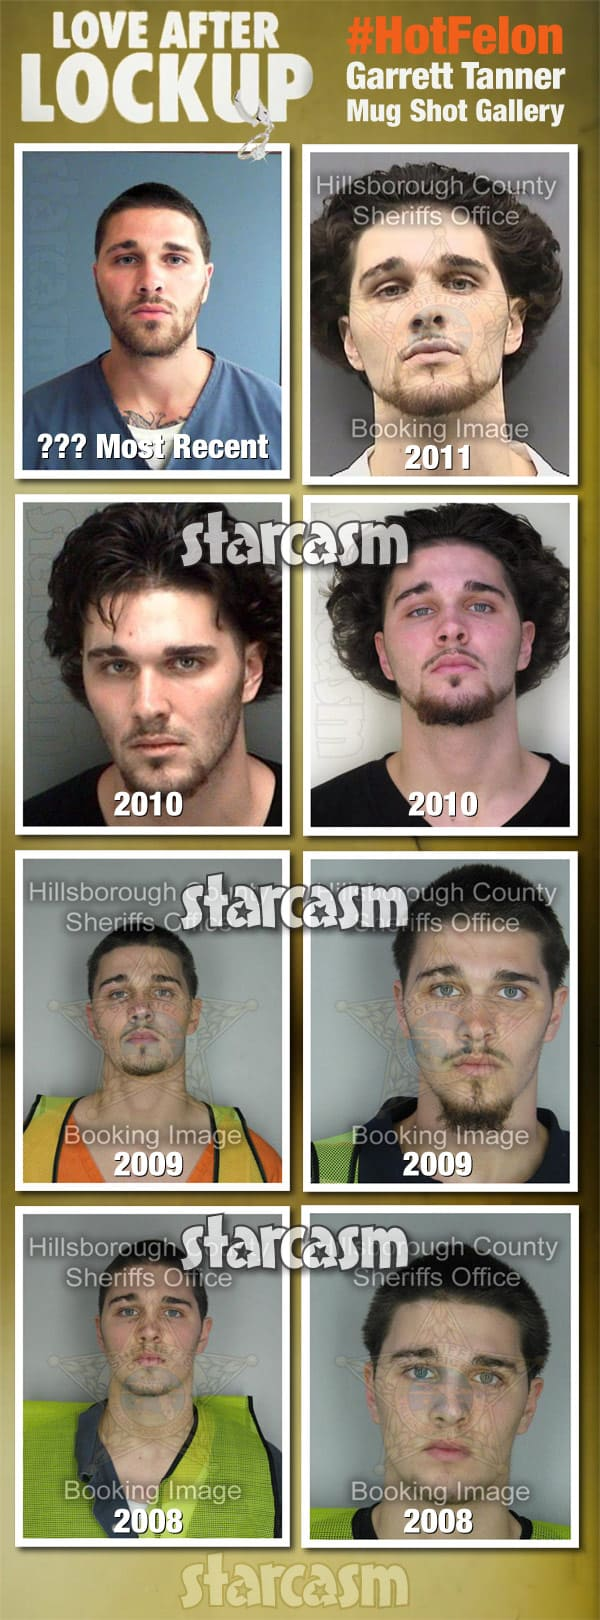 Love After Lockup Garrett Tanner mug shot photos arrests